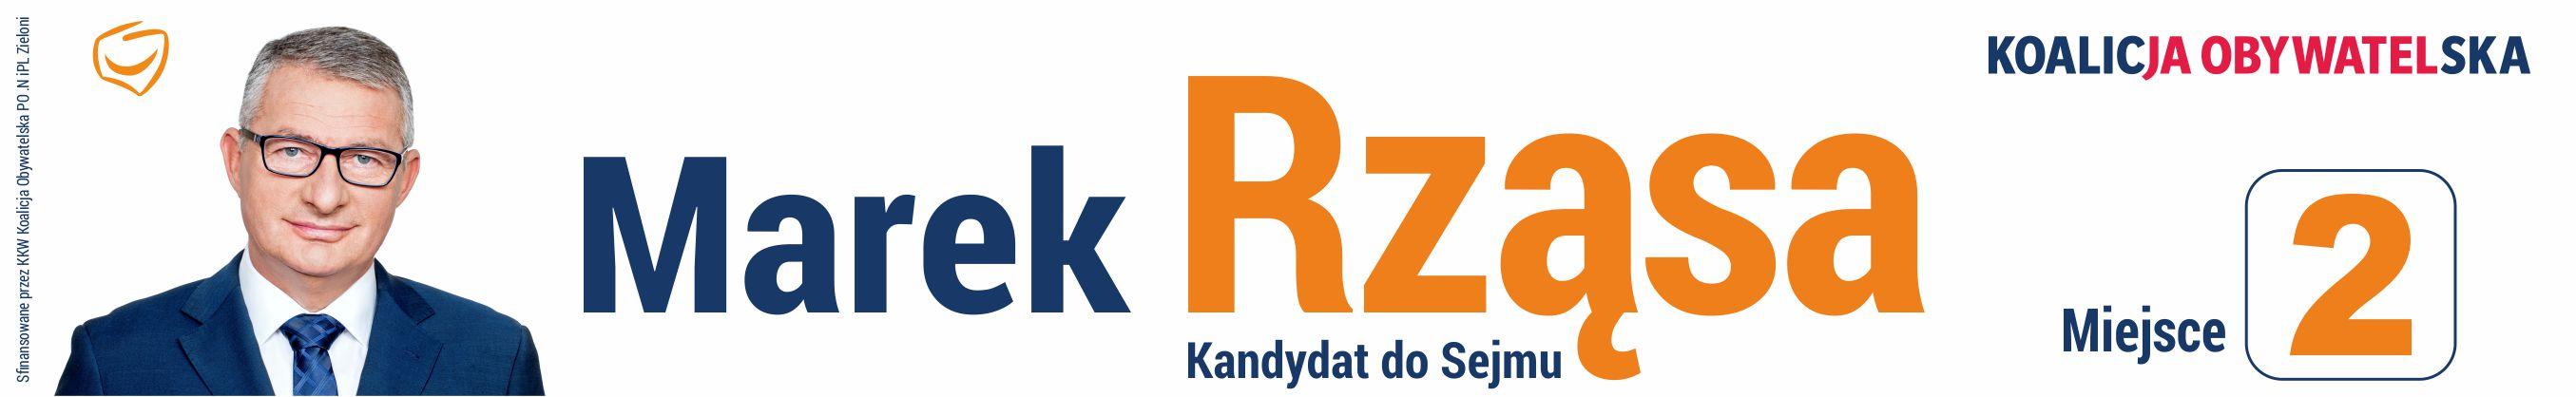 MarekRzasa2019